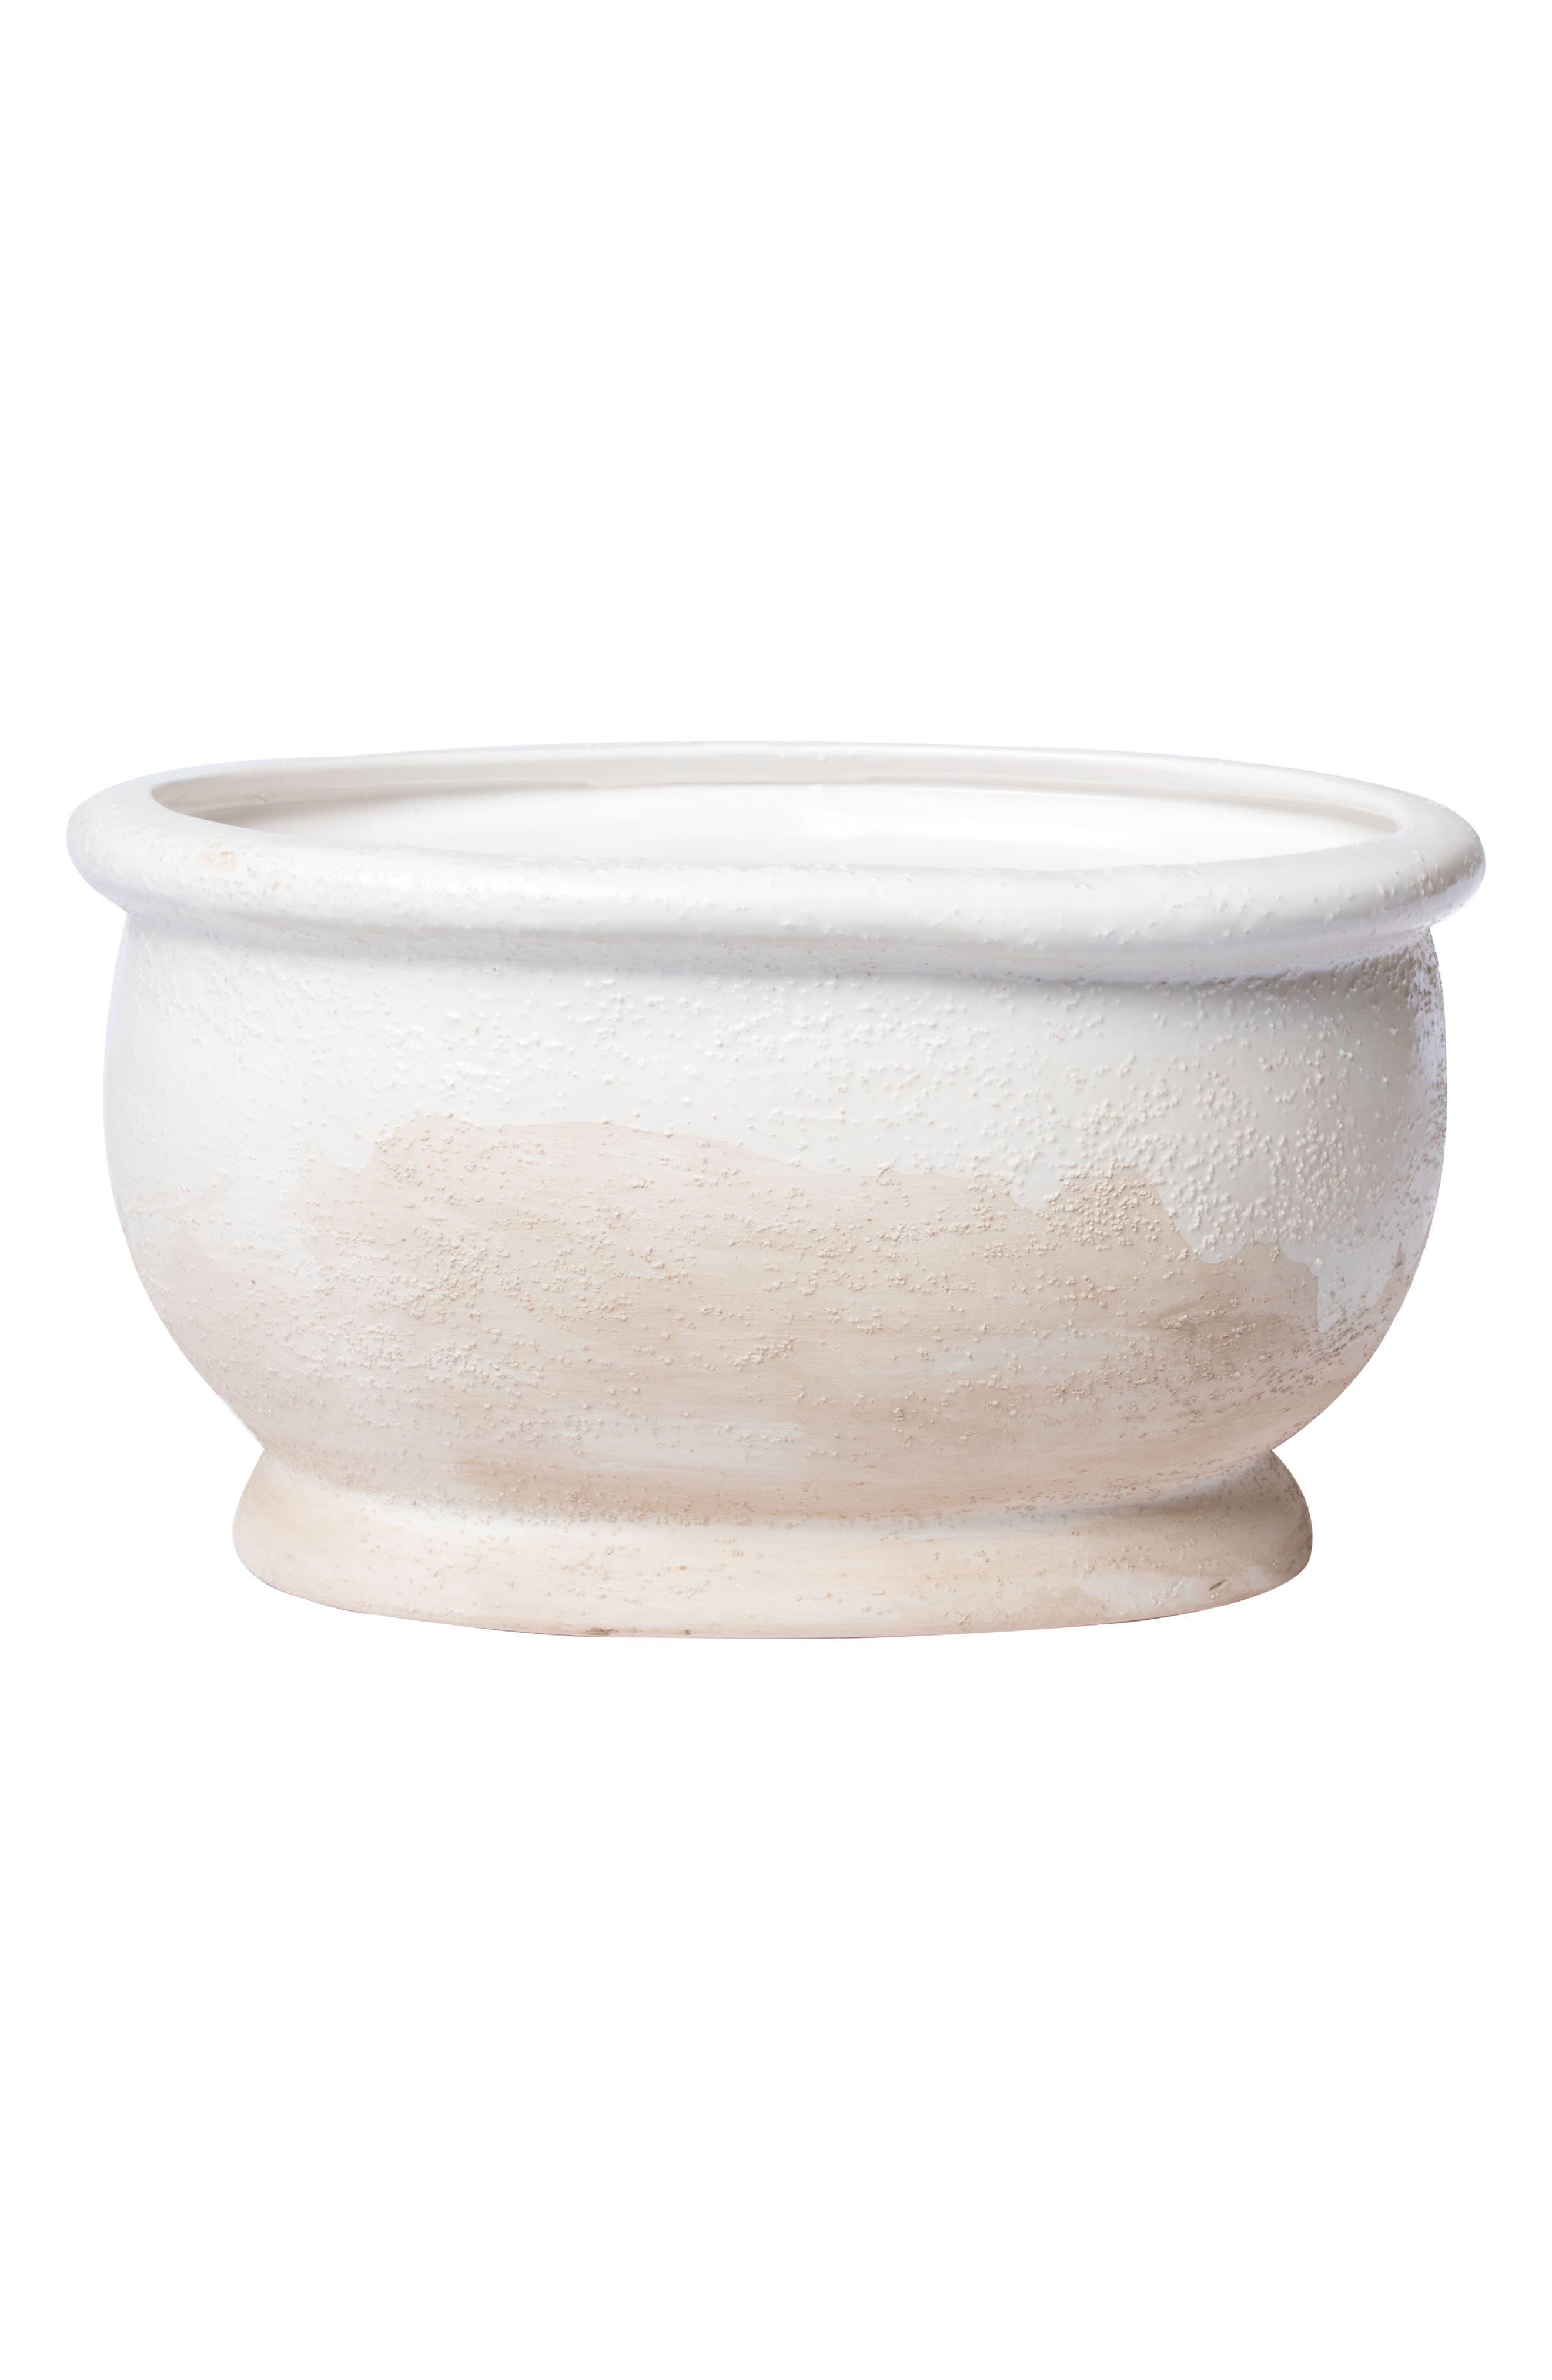 VIETRI Tuscan Texture Oval Cachepot